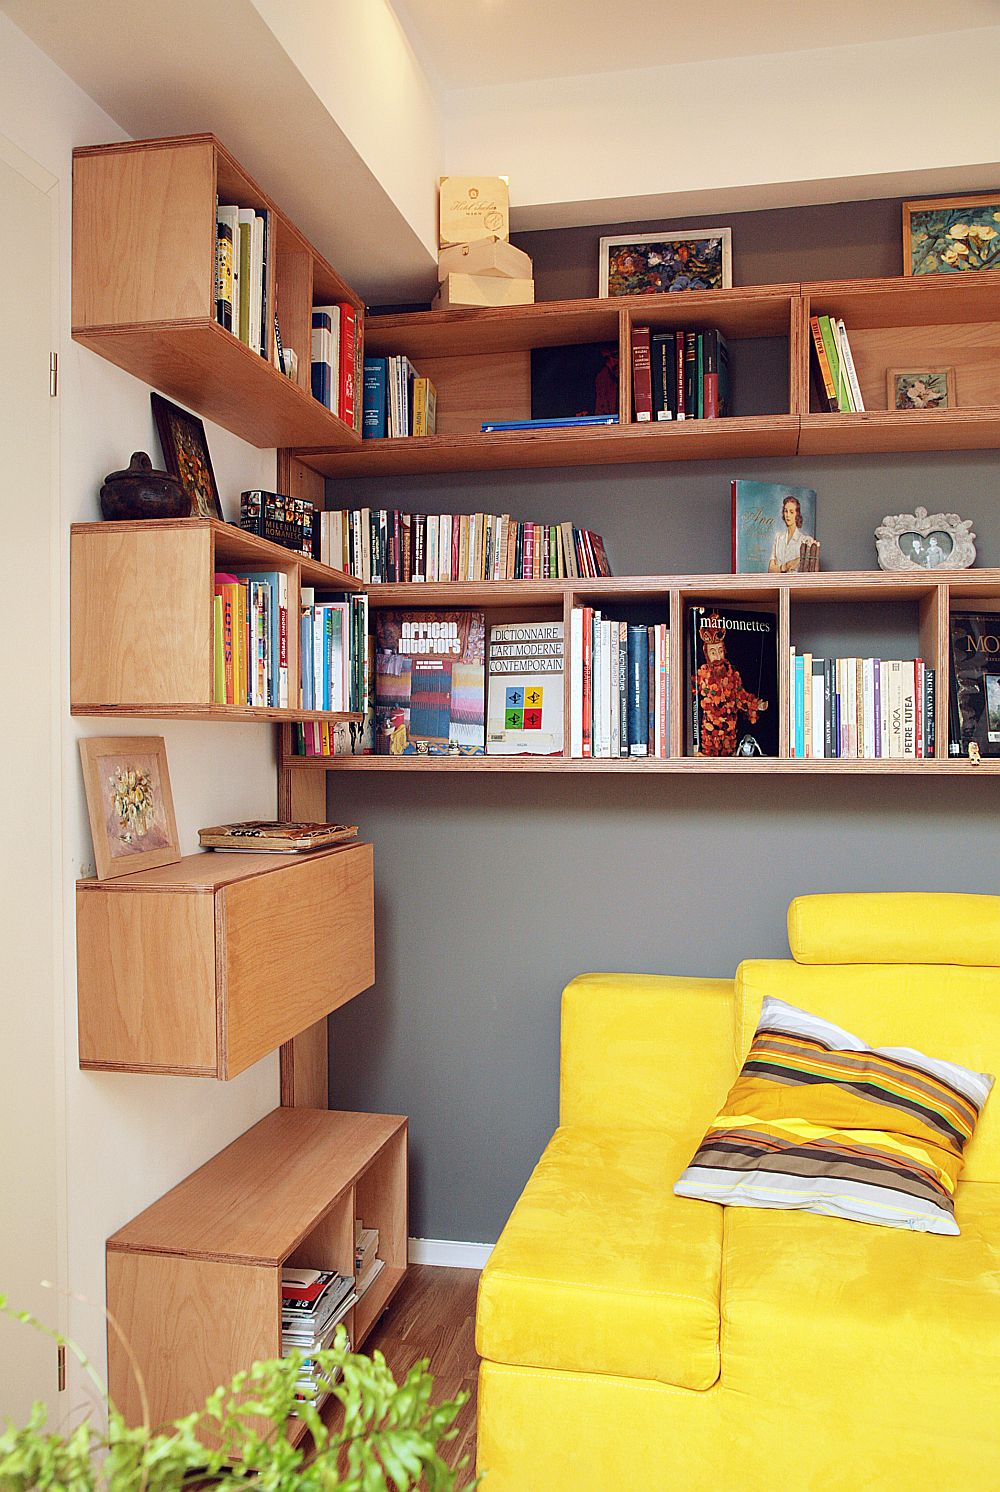 adelaparvu.com despre apartament de doua camere in Bucuresti ingenios amenajat, design ValDecor, Foto Alia Bakutayan (13)